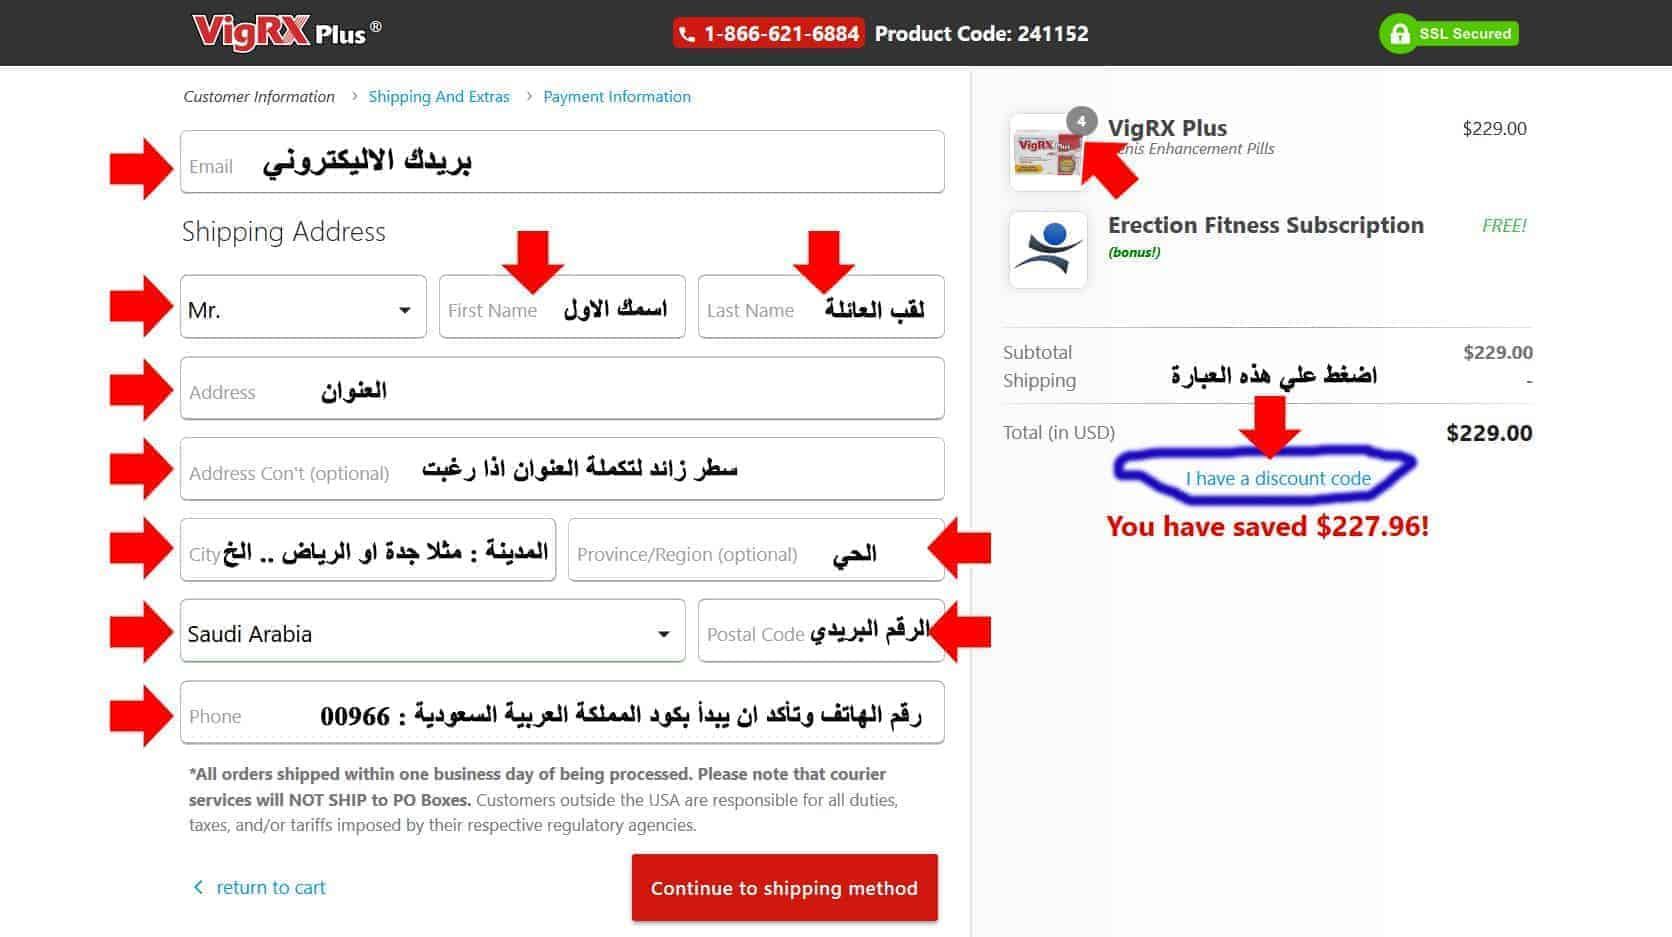 VigRX Plus Saudi Arabia Order 001